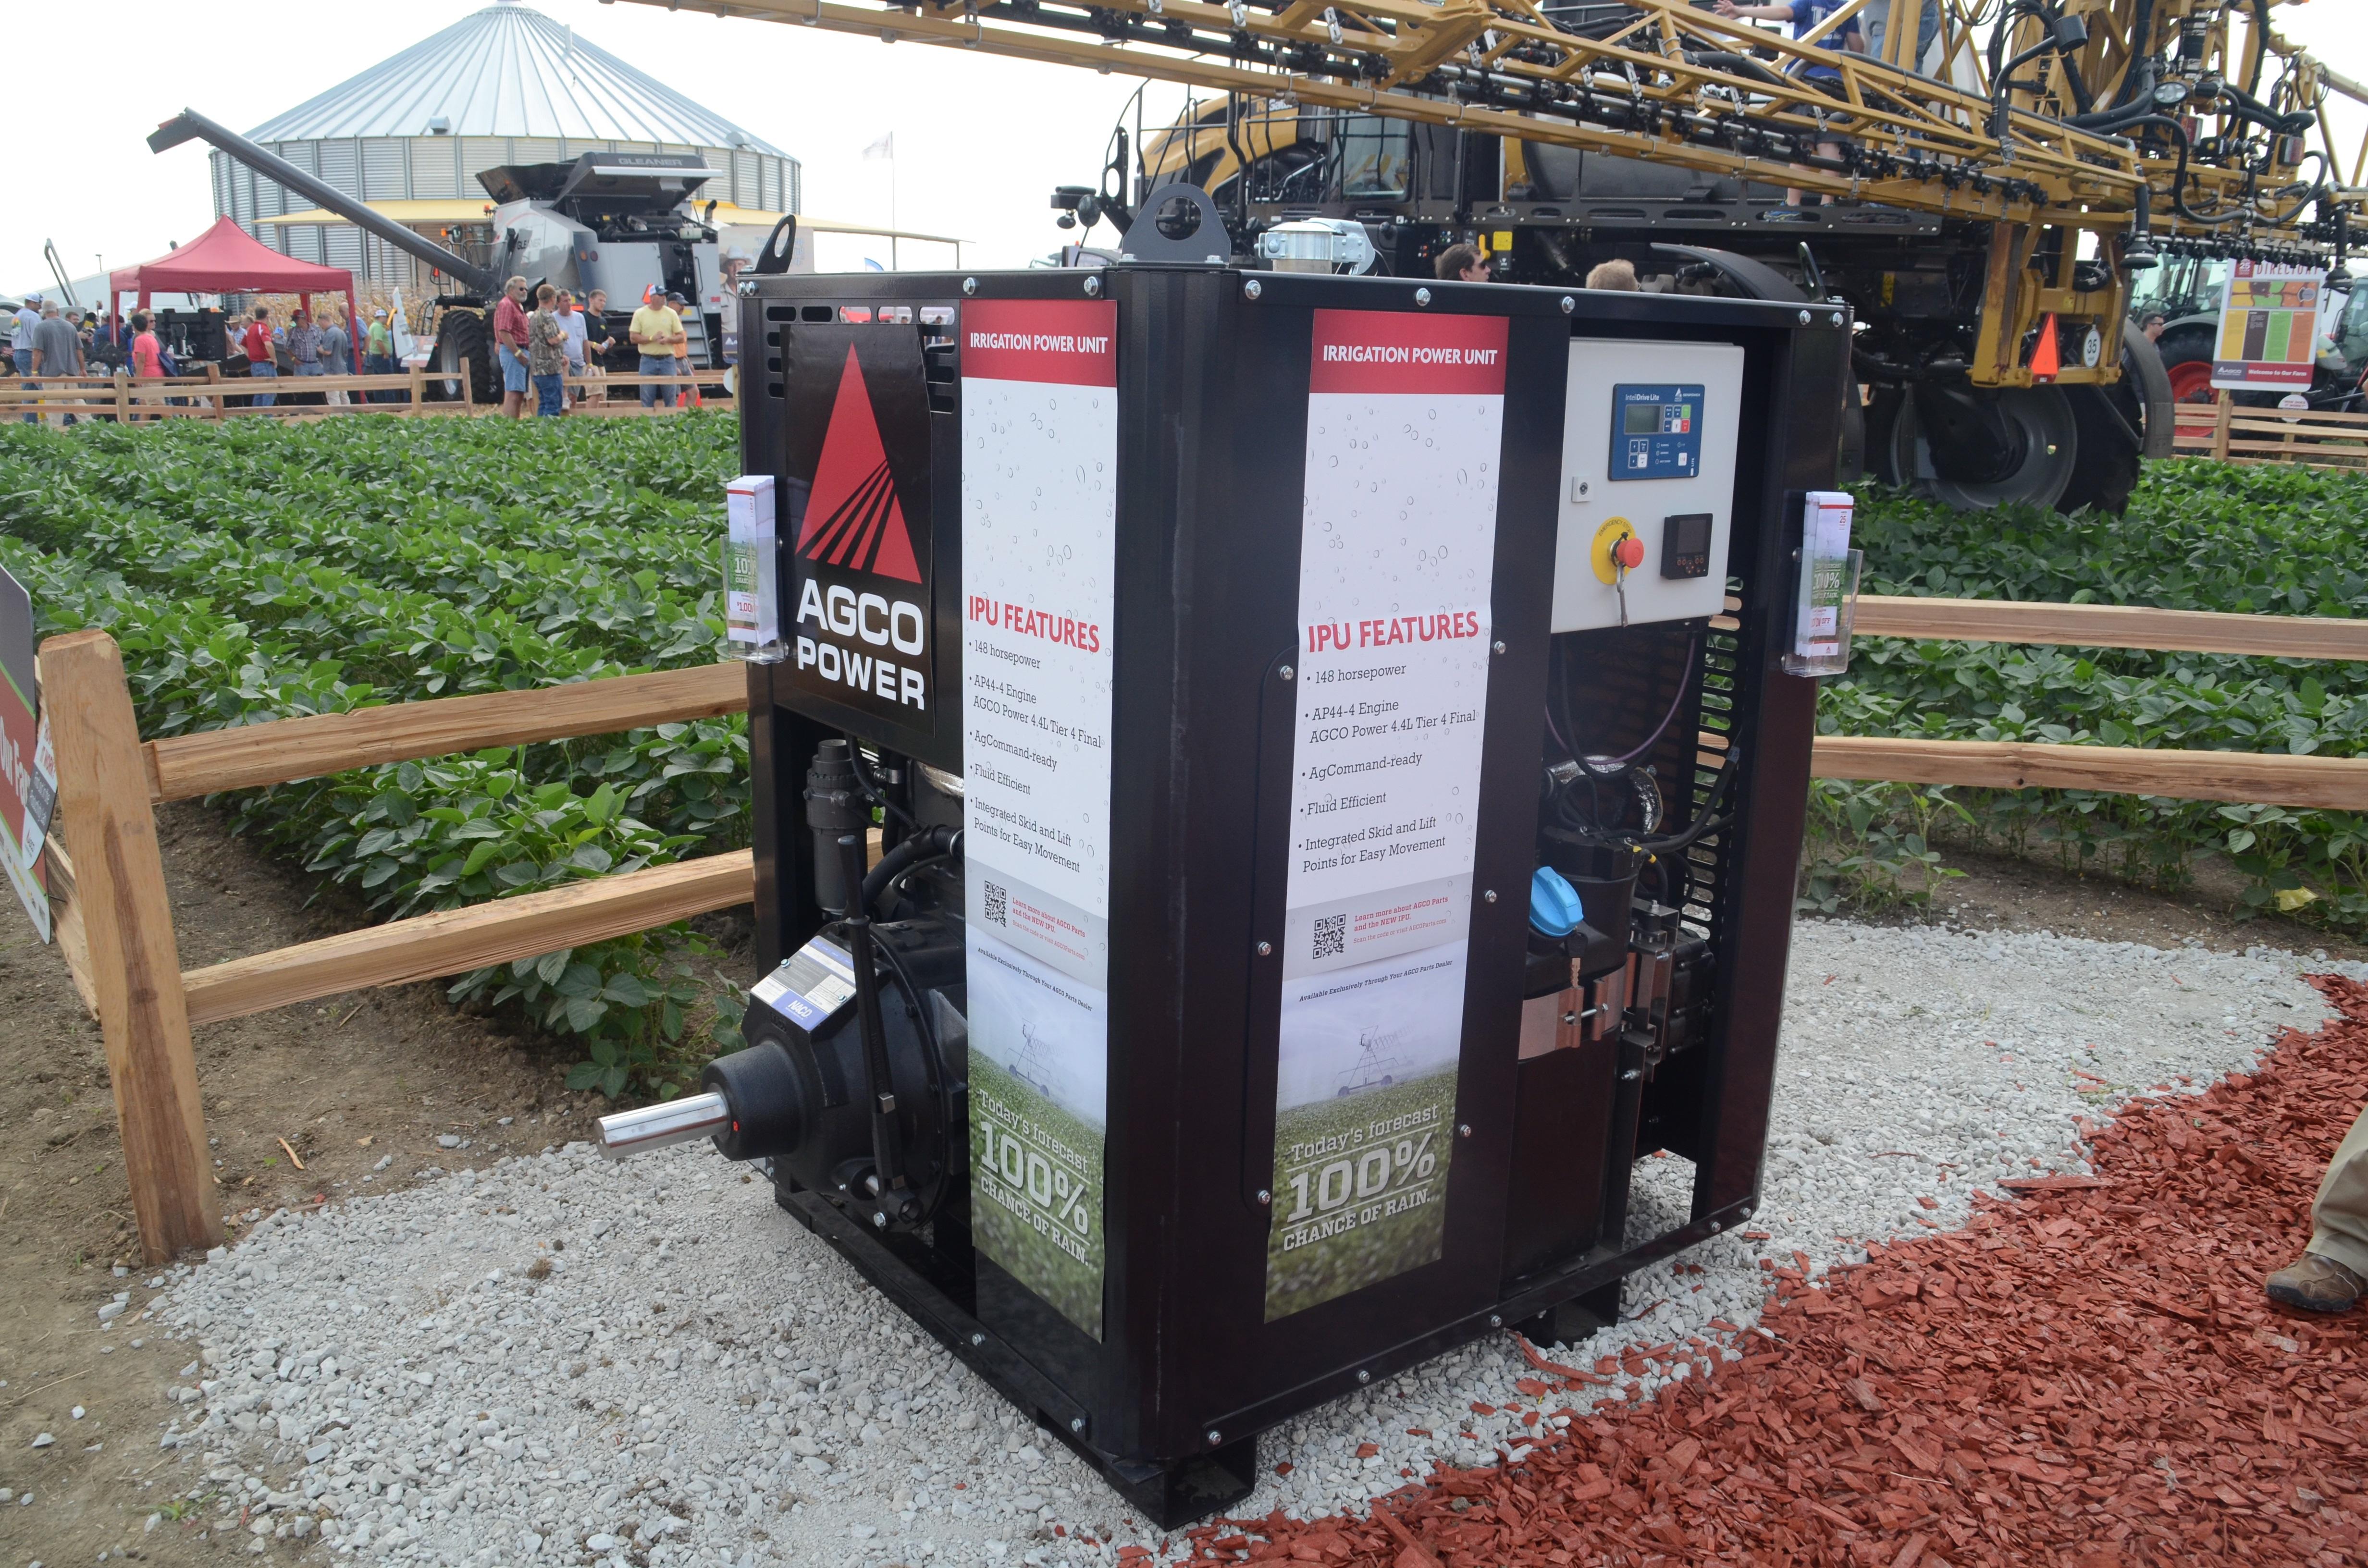 AGCO Introduces 150 Horsepower Portable Irrigation Power